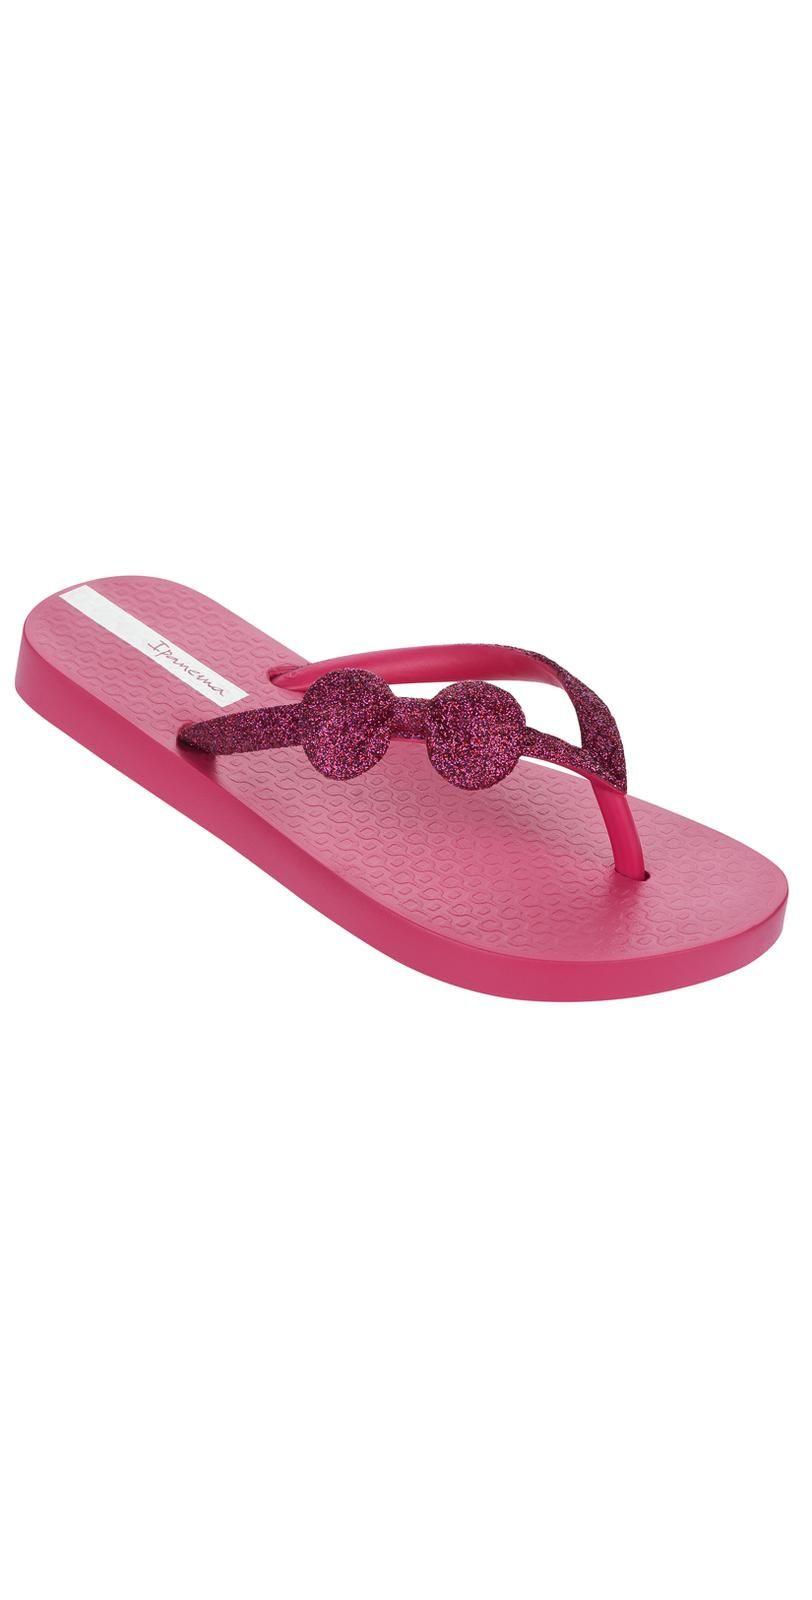 3d4e49d9dc68  iPanema Kid s Glitter Bow Fuschia  Sandal 81260-FUS  southbeachswimsuits